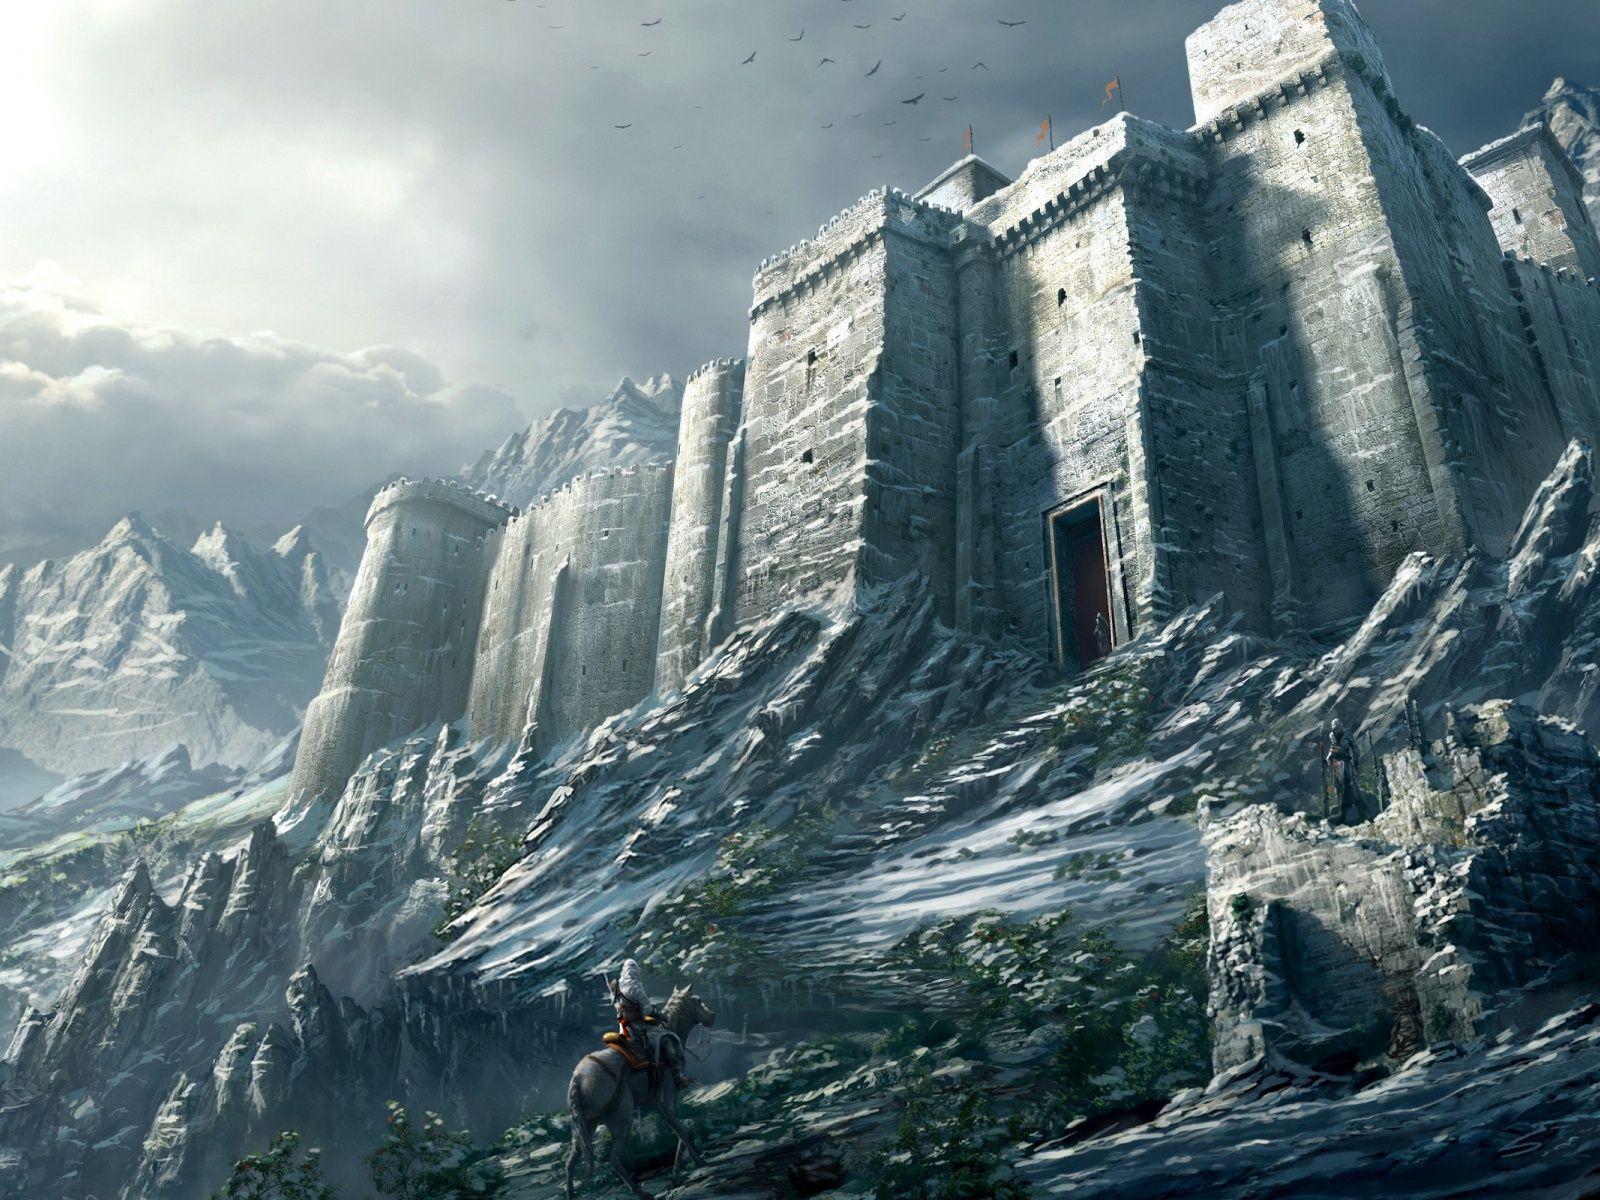 5303-forteresse-des-montagnes-WallFizz.jpg (Image JPEG, 1600×1200 pixels) - Redimensionnée (56%)